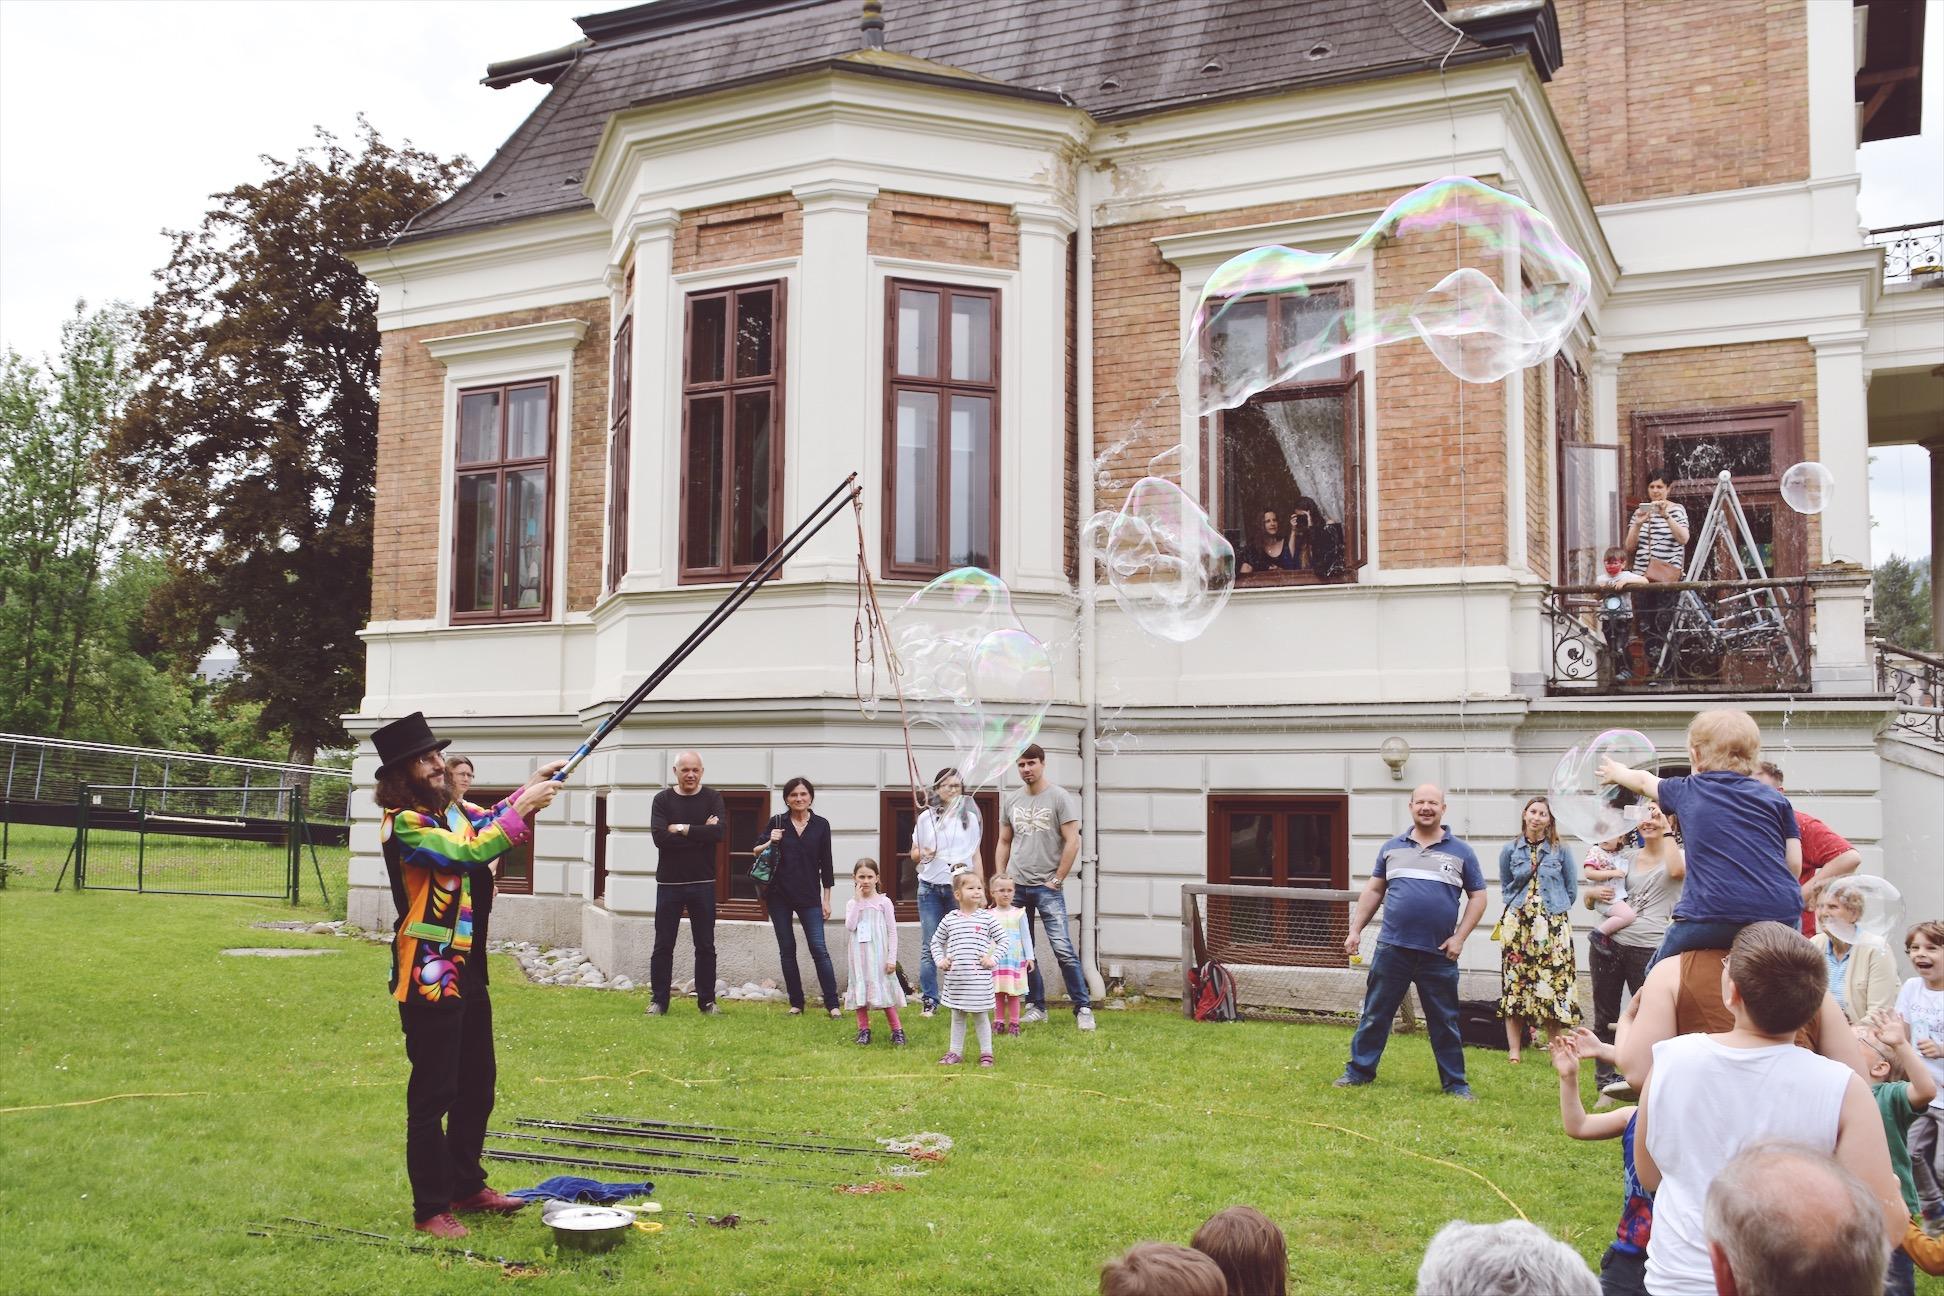 zaubervilla-familienfest-2018-05.JPG